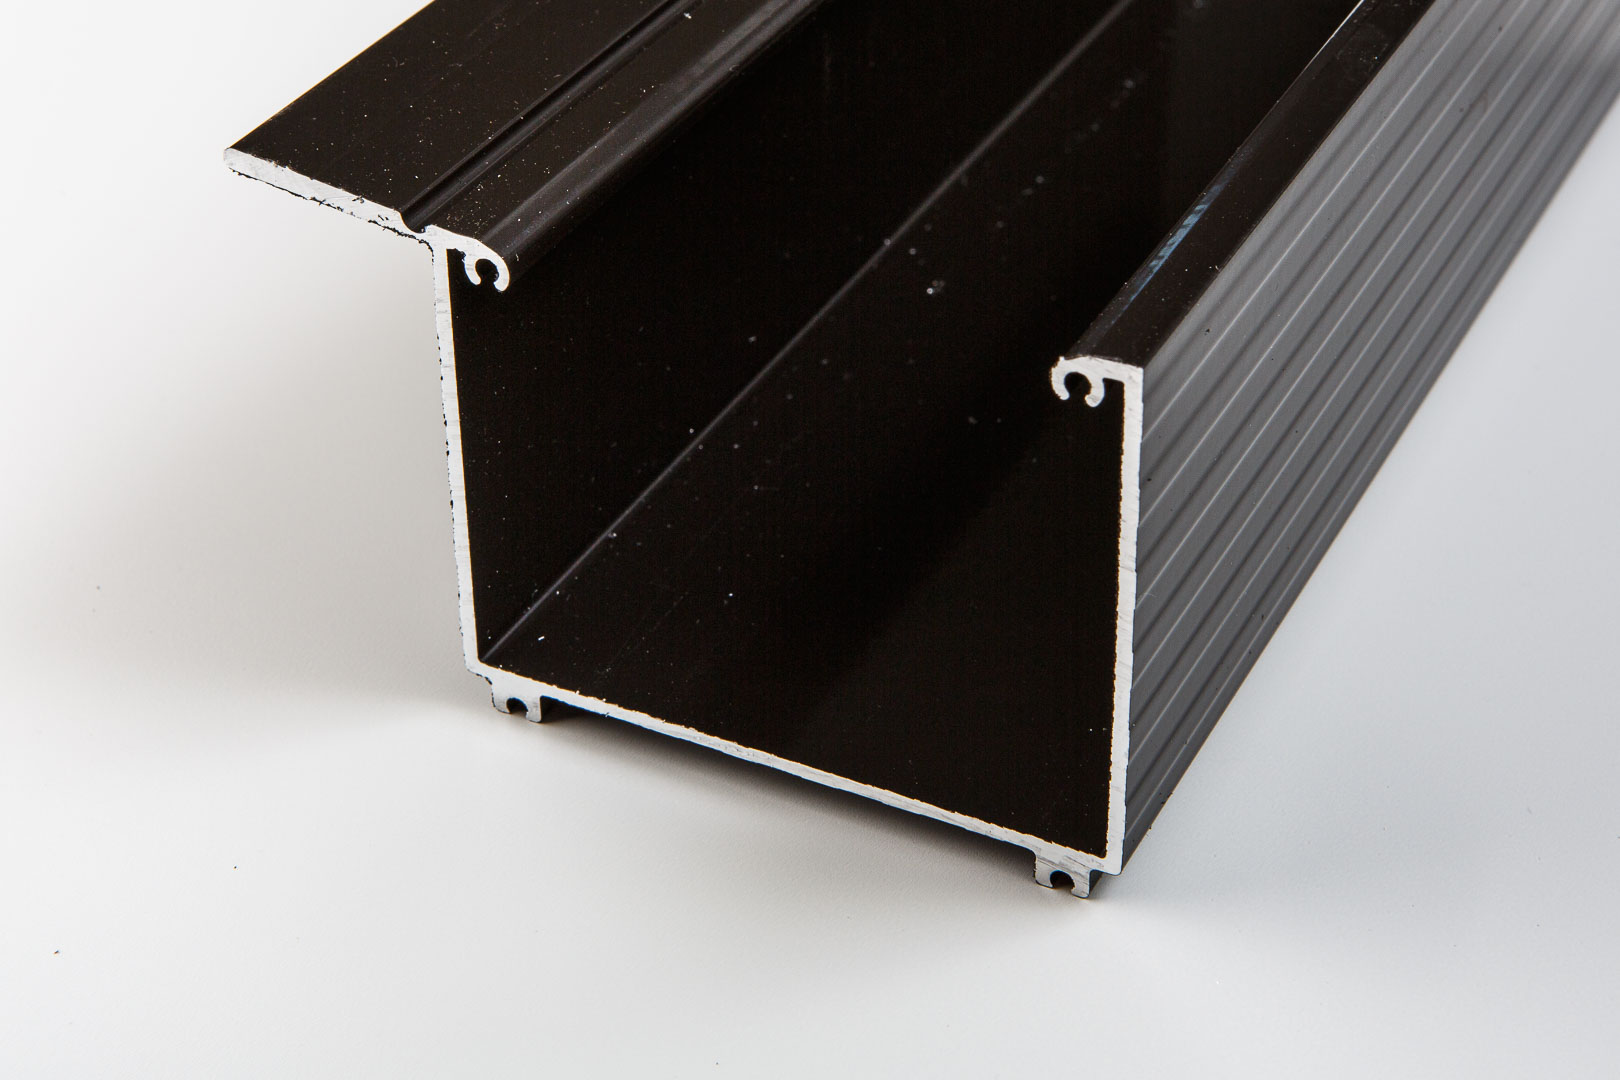 Aluminium Kastenrinne braun inkl. Zubehör